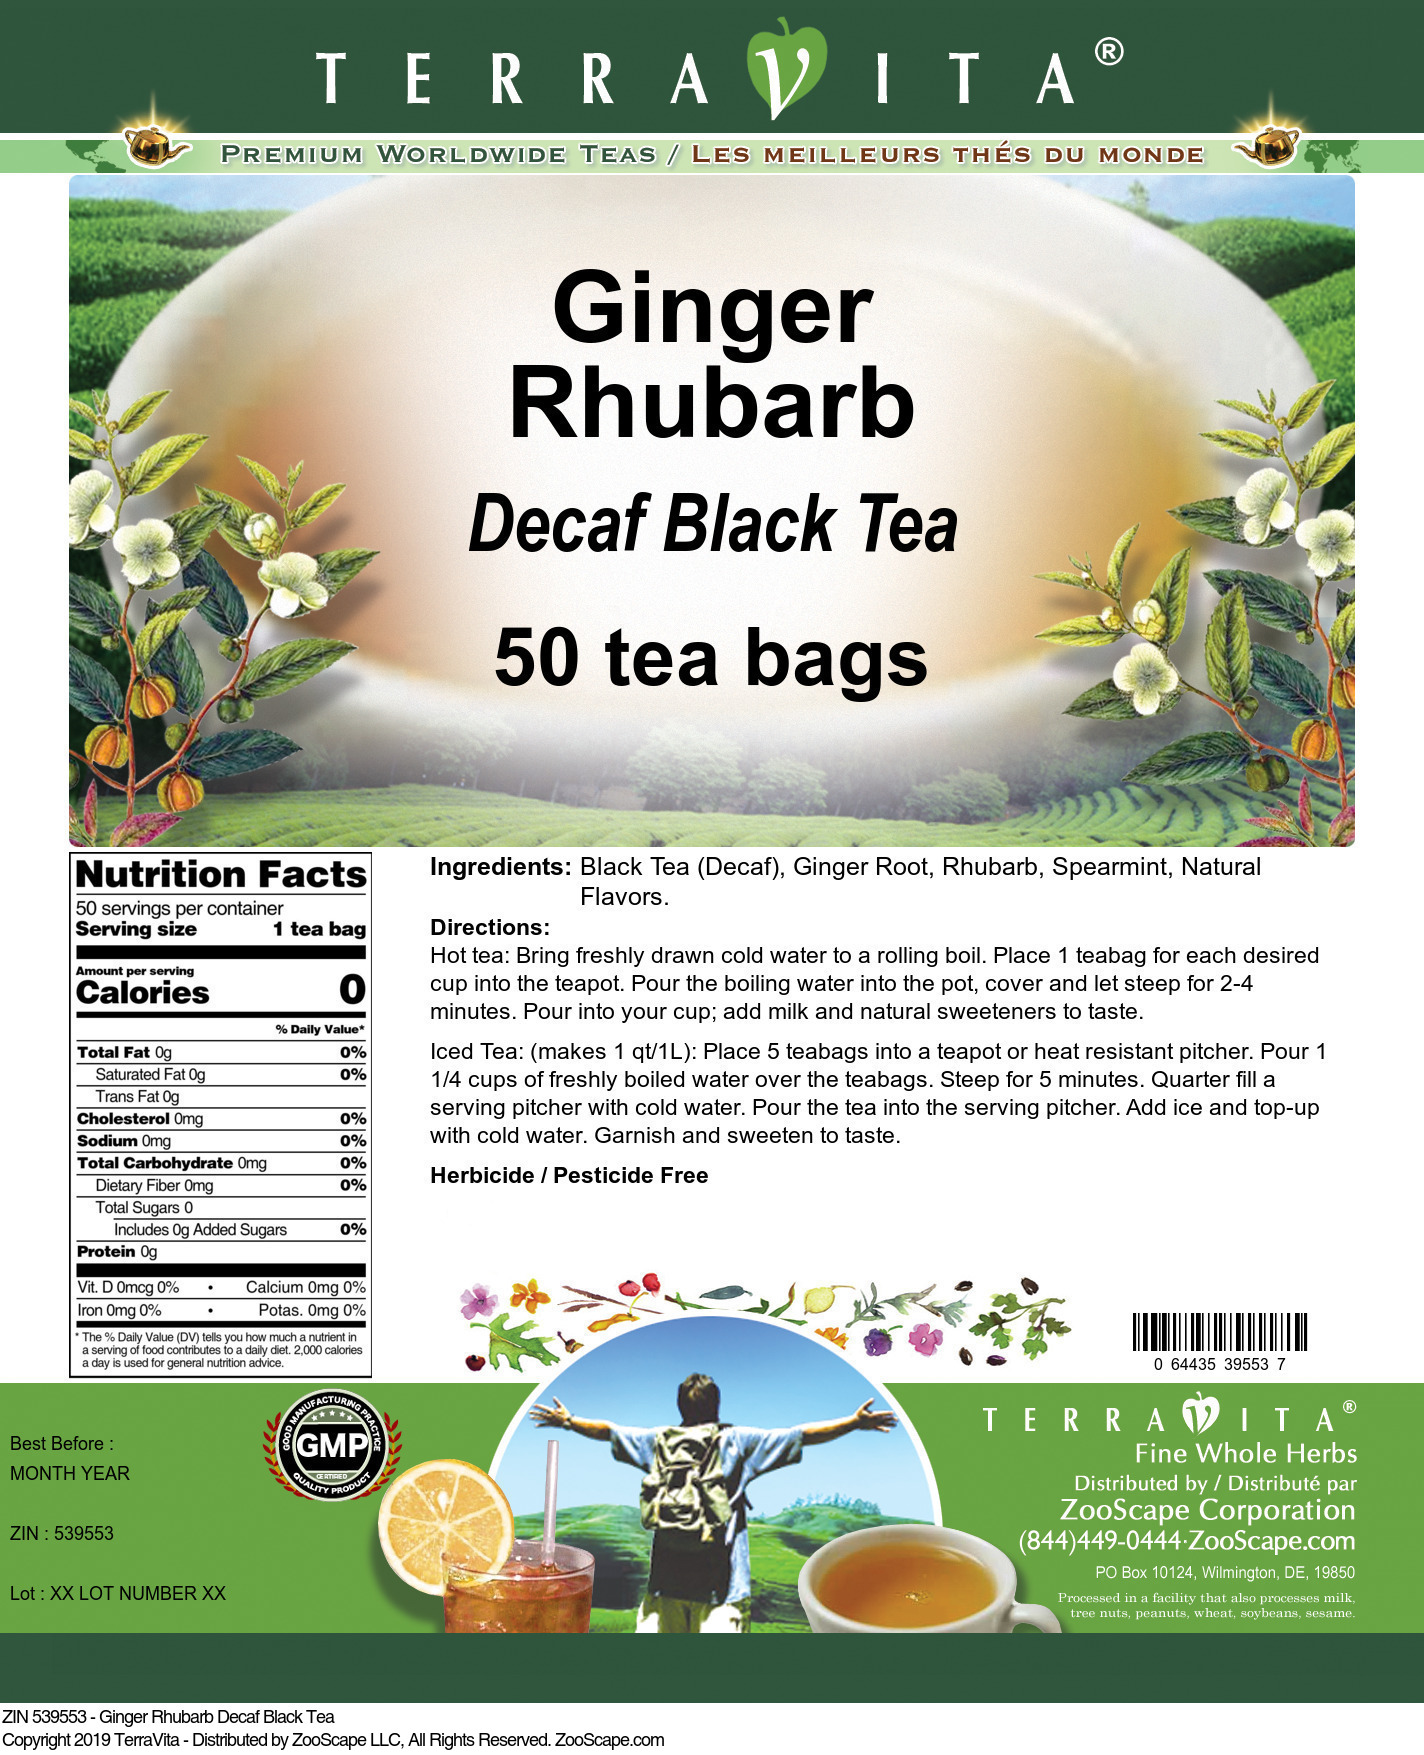 Ginger Rhubarb Decaf Black Tea